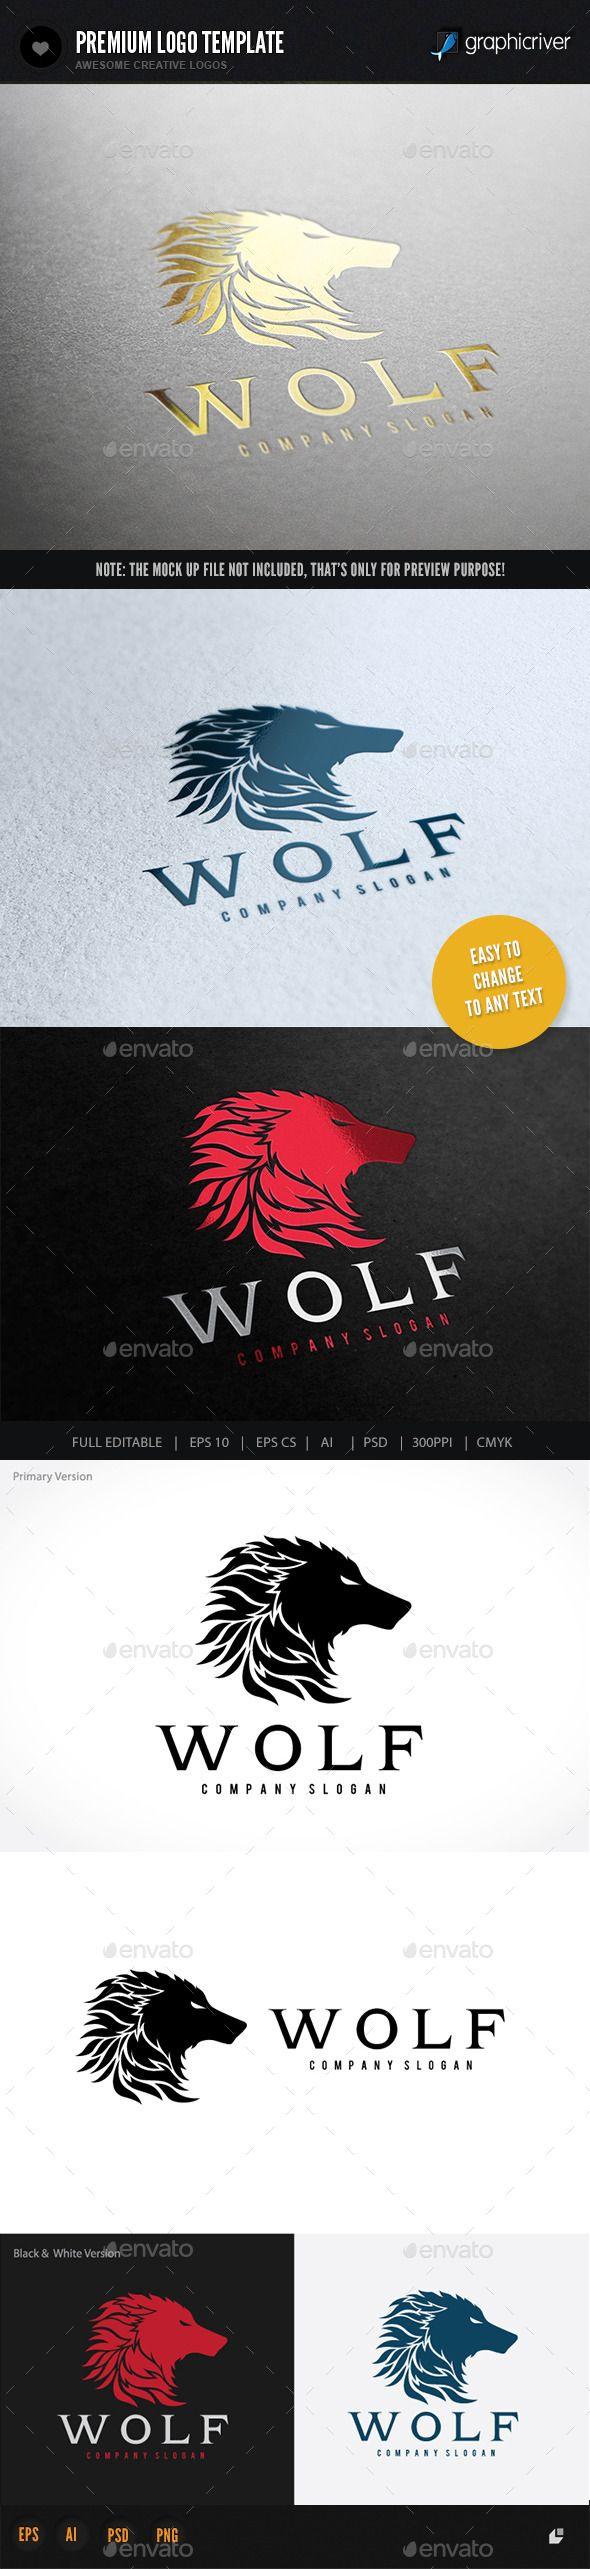 Wolf Logo Template #design #logotype Download: http://graphicriver.net/item/wolf/9318437?ref=ksioks